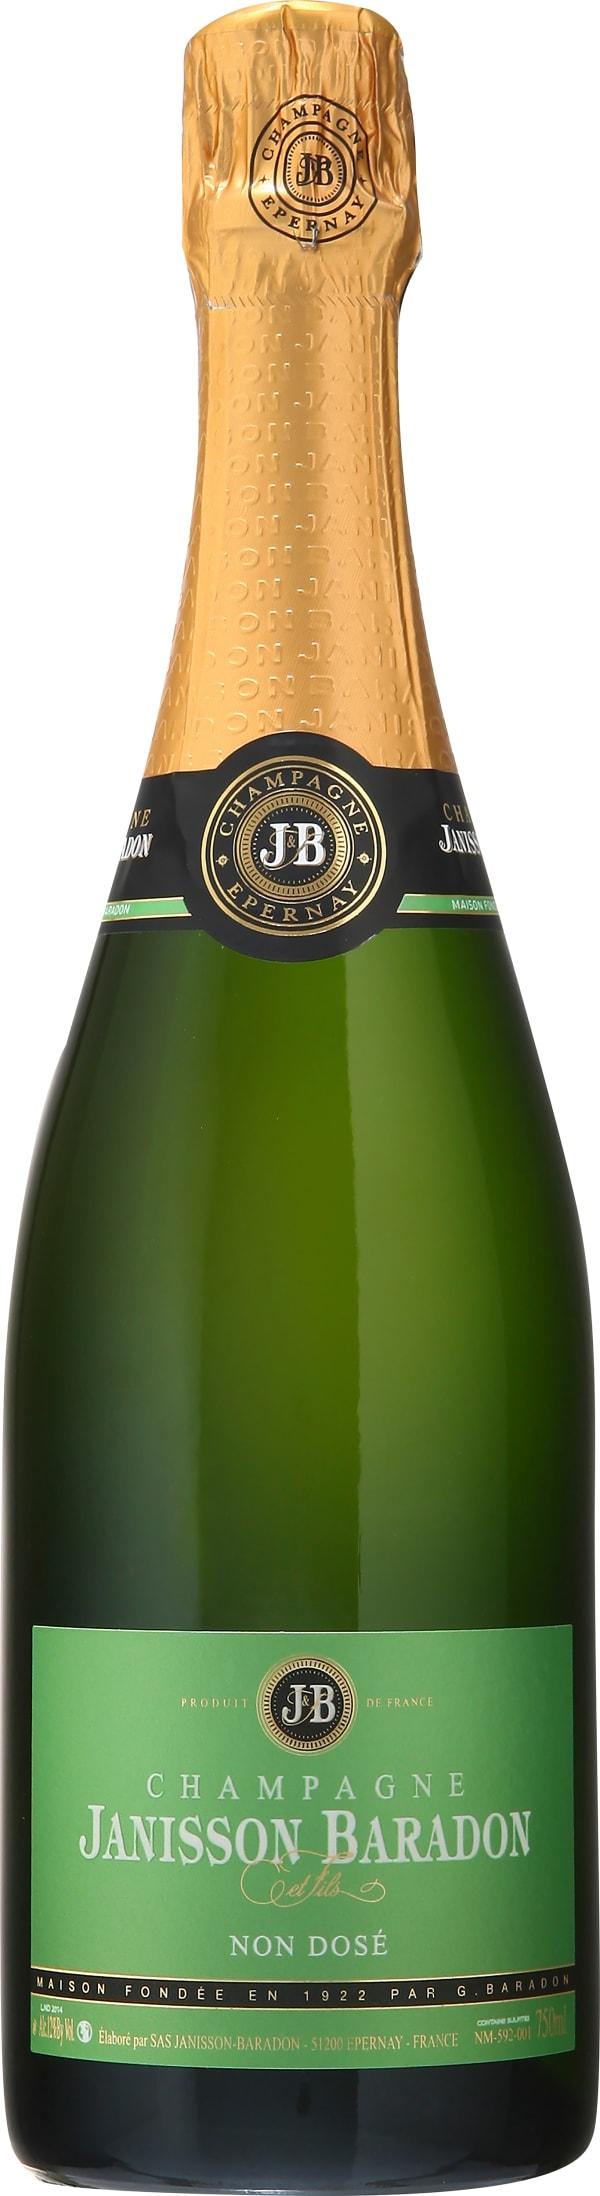 Janisson Baradon Non Dosé Champagne Brut